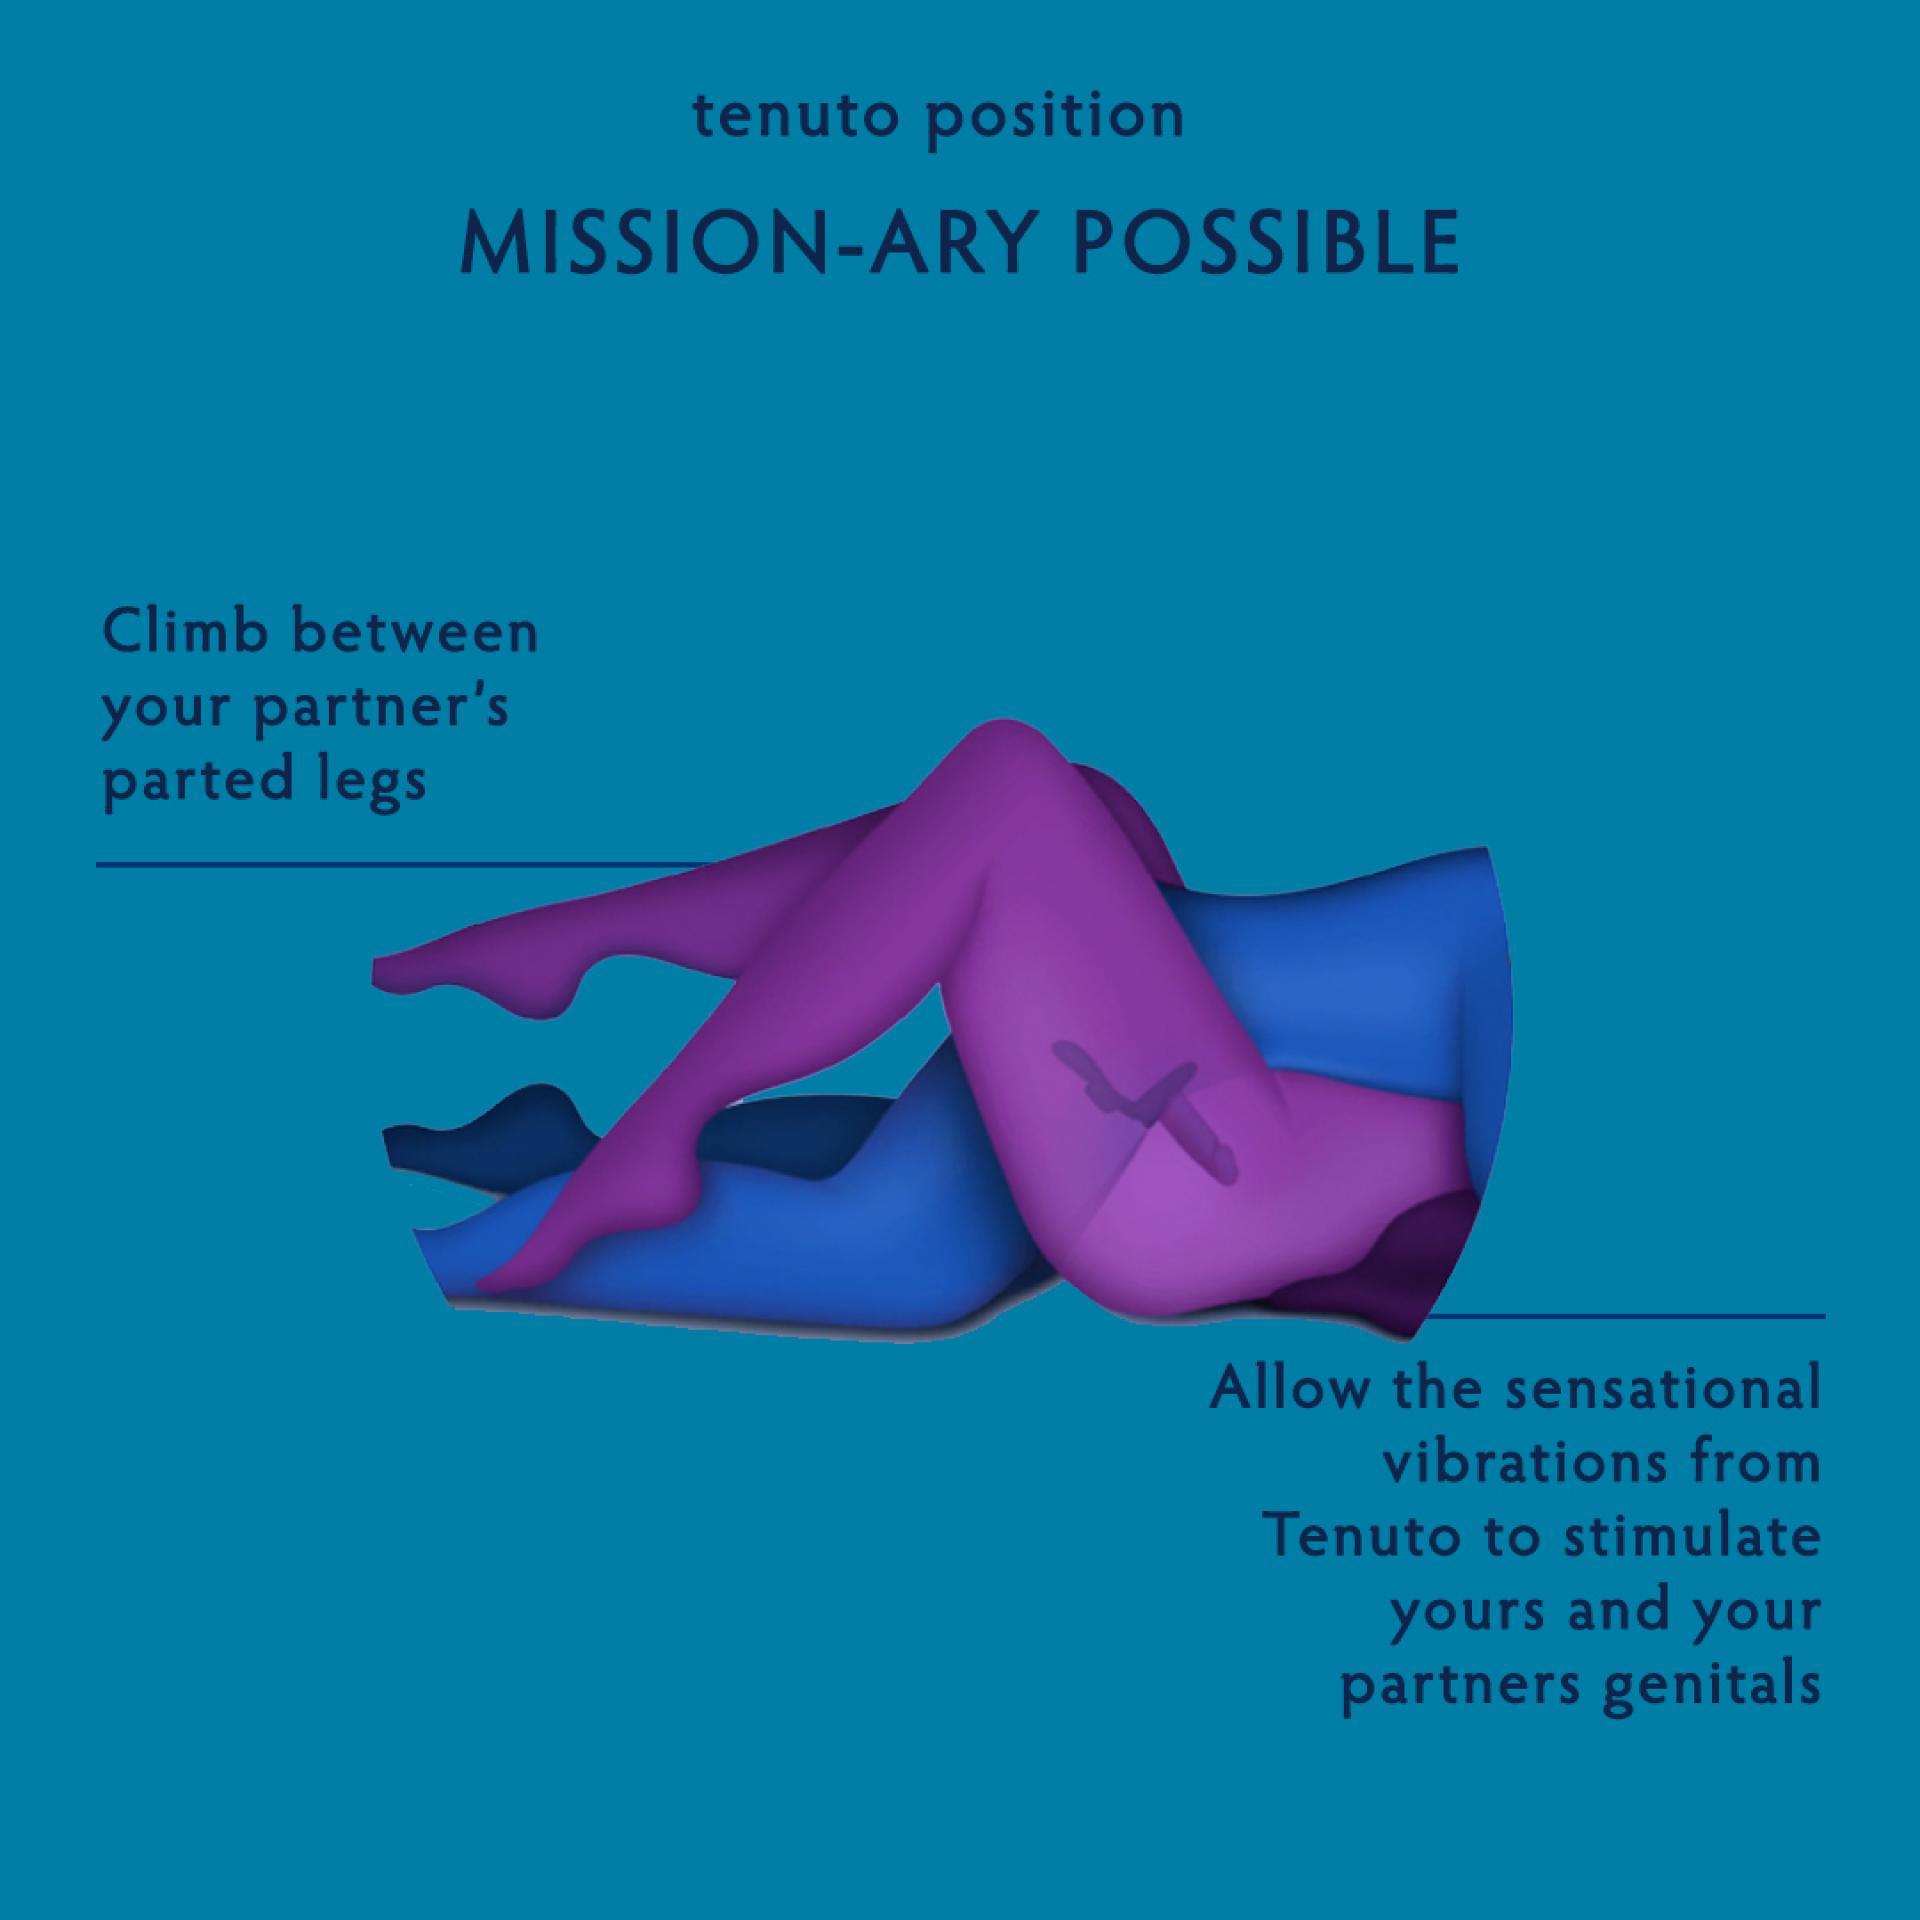 SDC MysteryVibe Tenuto App Sex Game Toy Pleasure Product